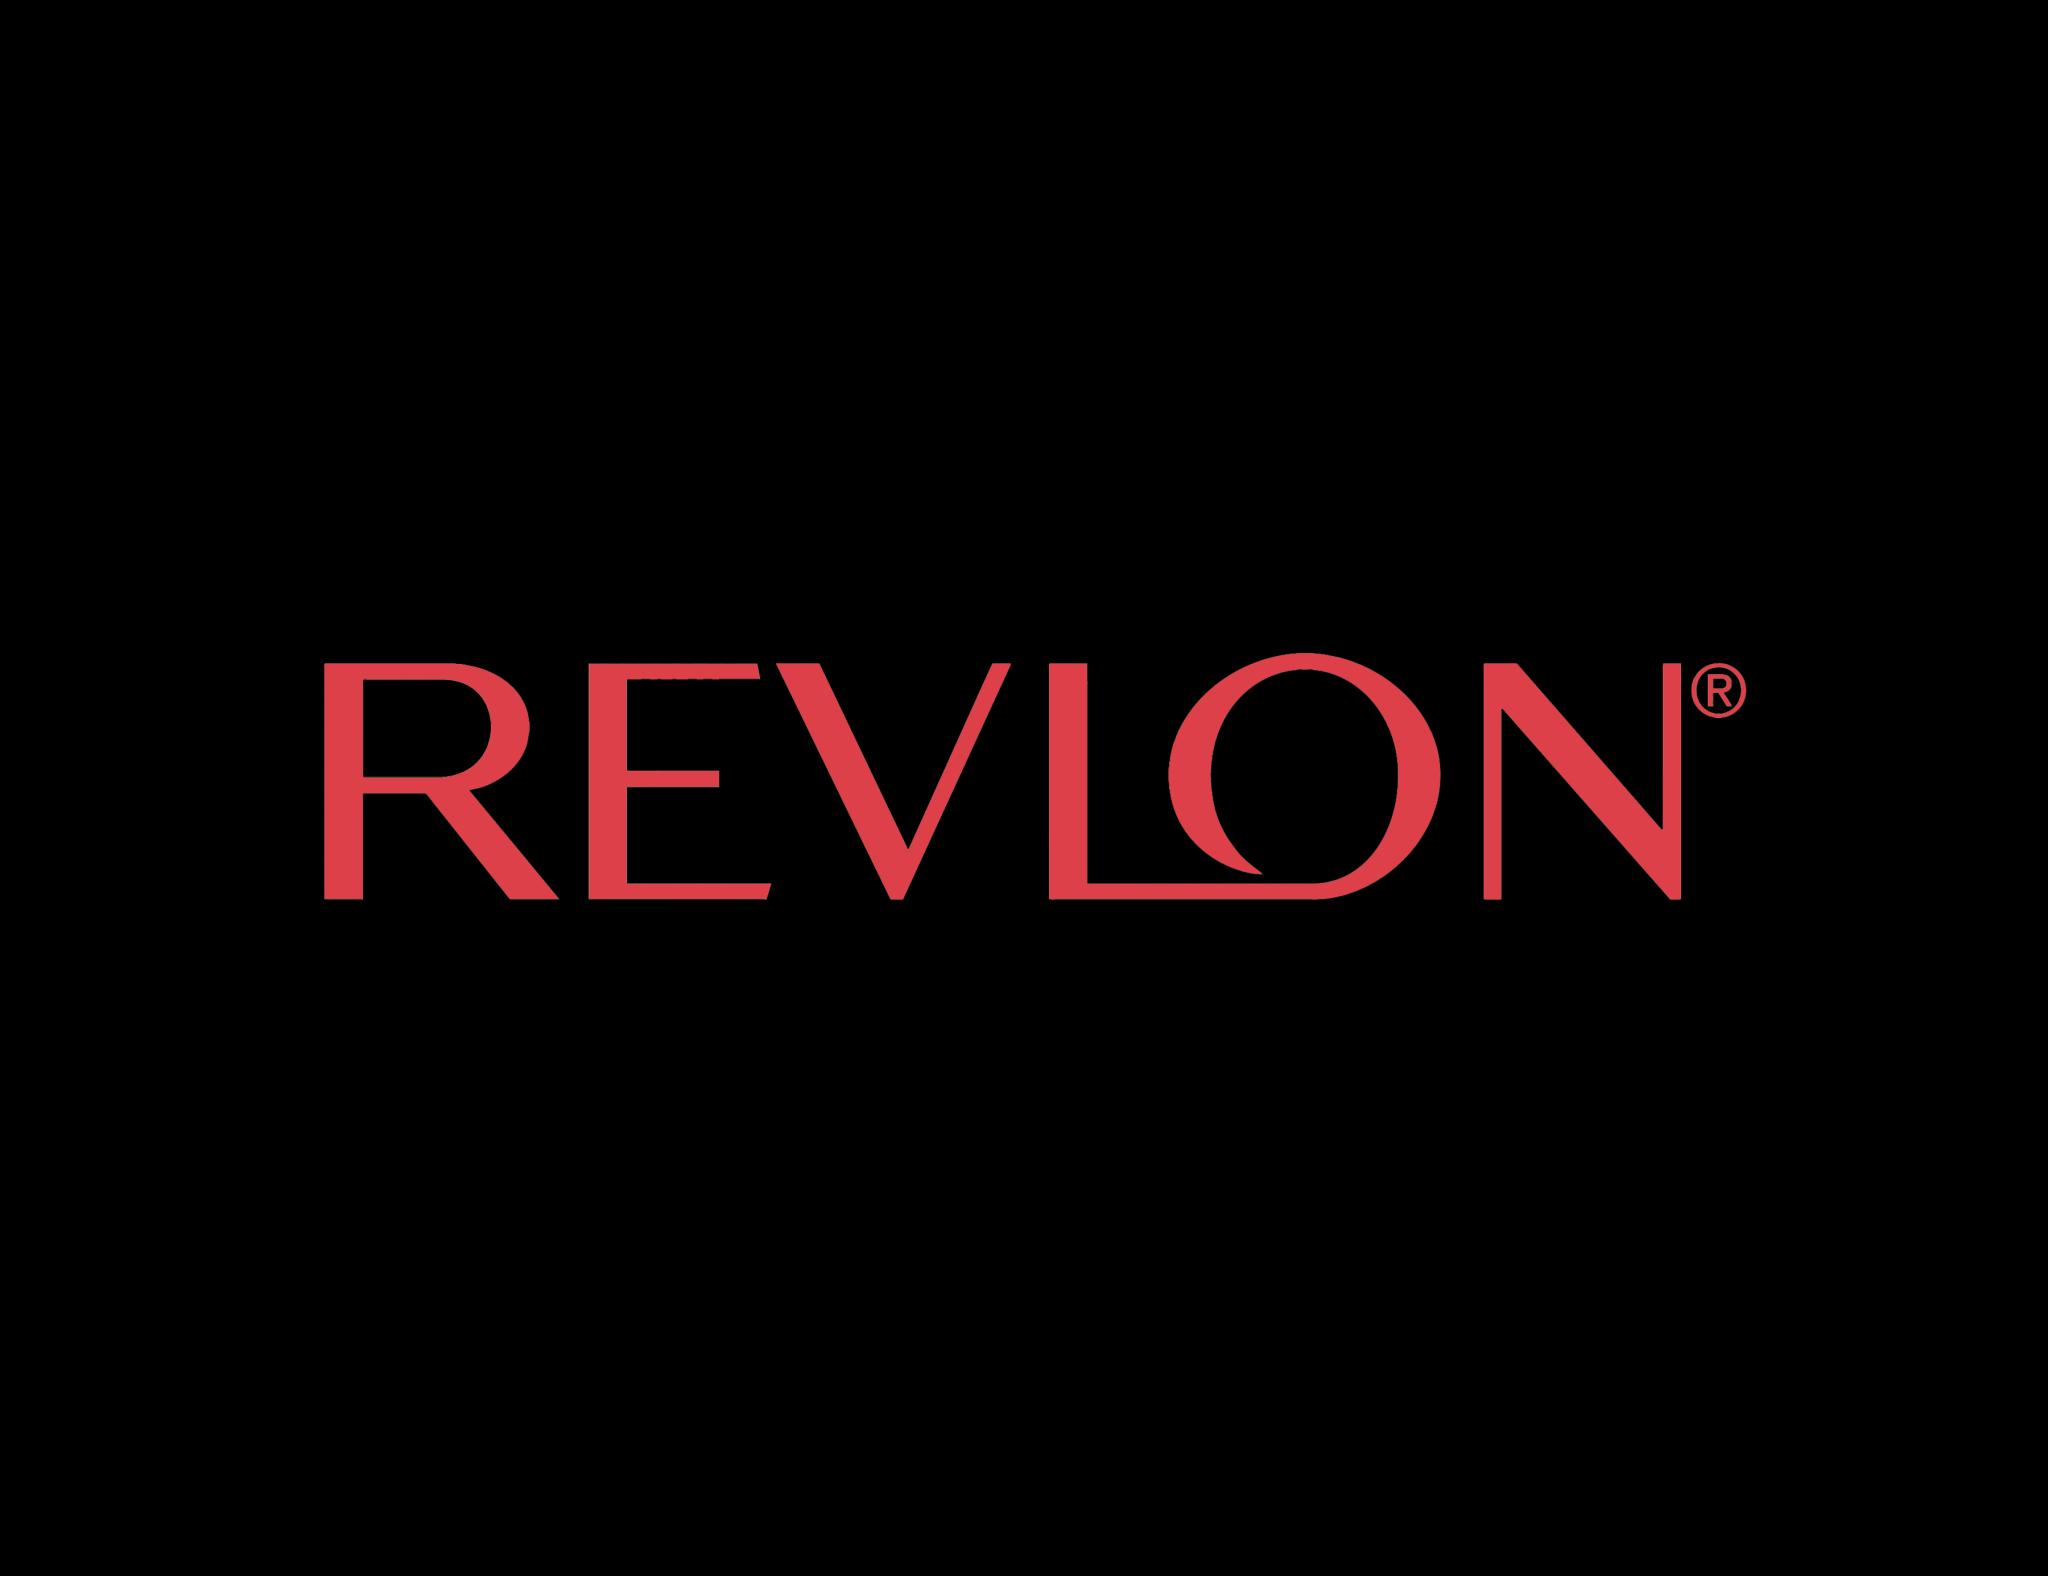 revlon logo logojoy rh logojoy com revlon logo vector download revlon logo transparent